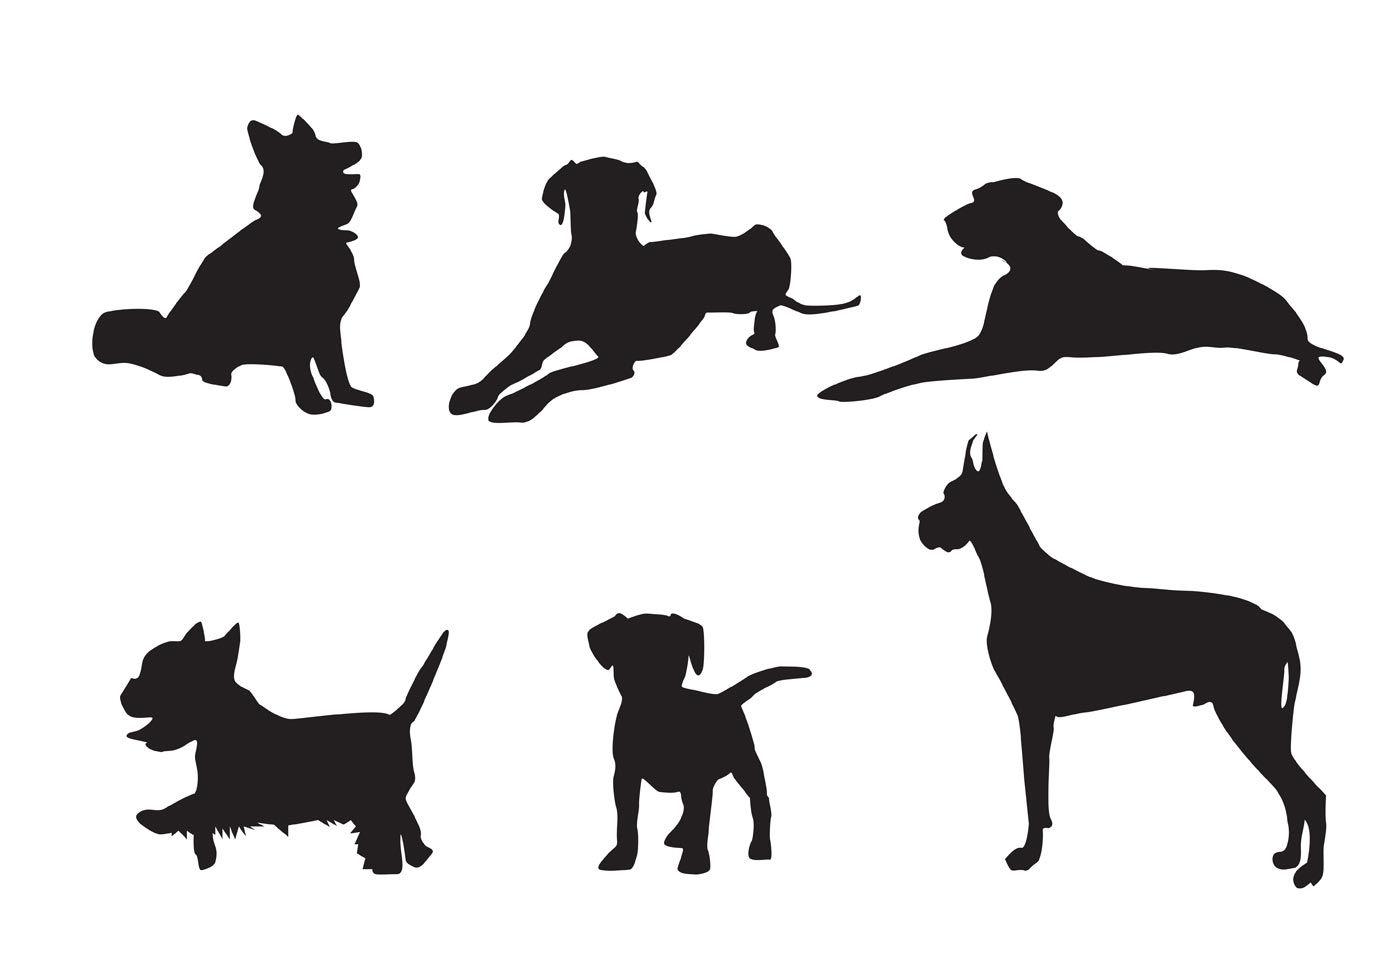 free vector dog silhouette vectors silhouette pinterest dog rh pinterest com free vector silhouette of cow eating free vector silhouette clip art